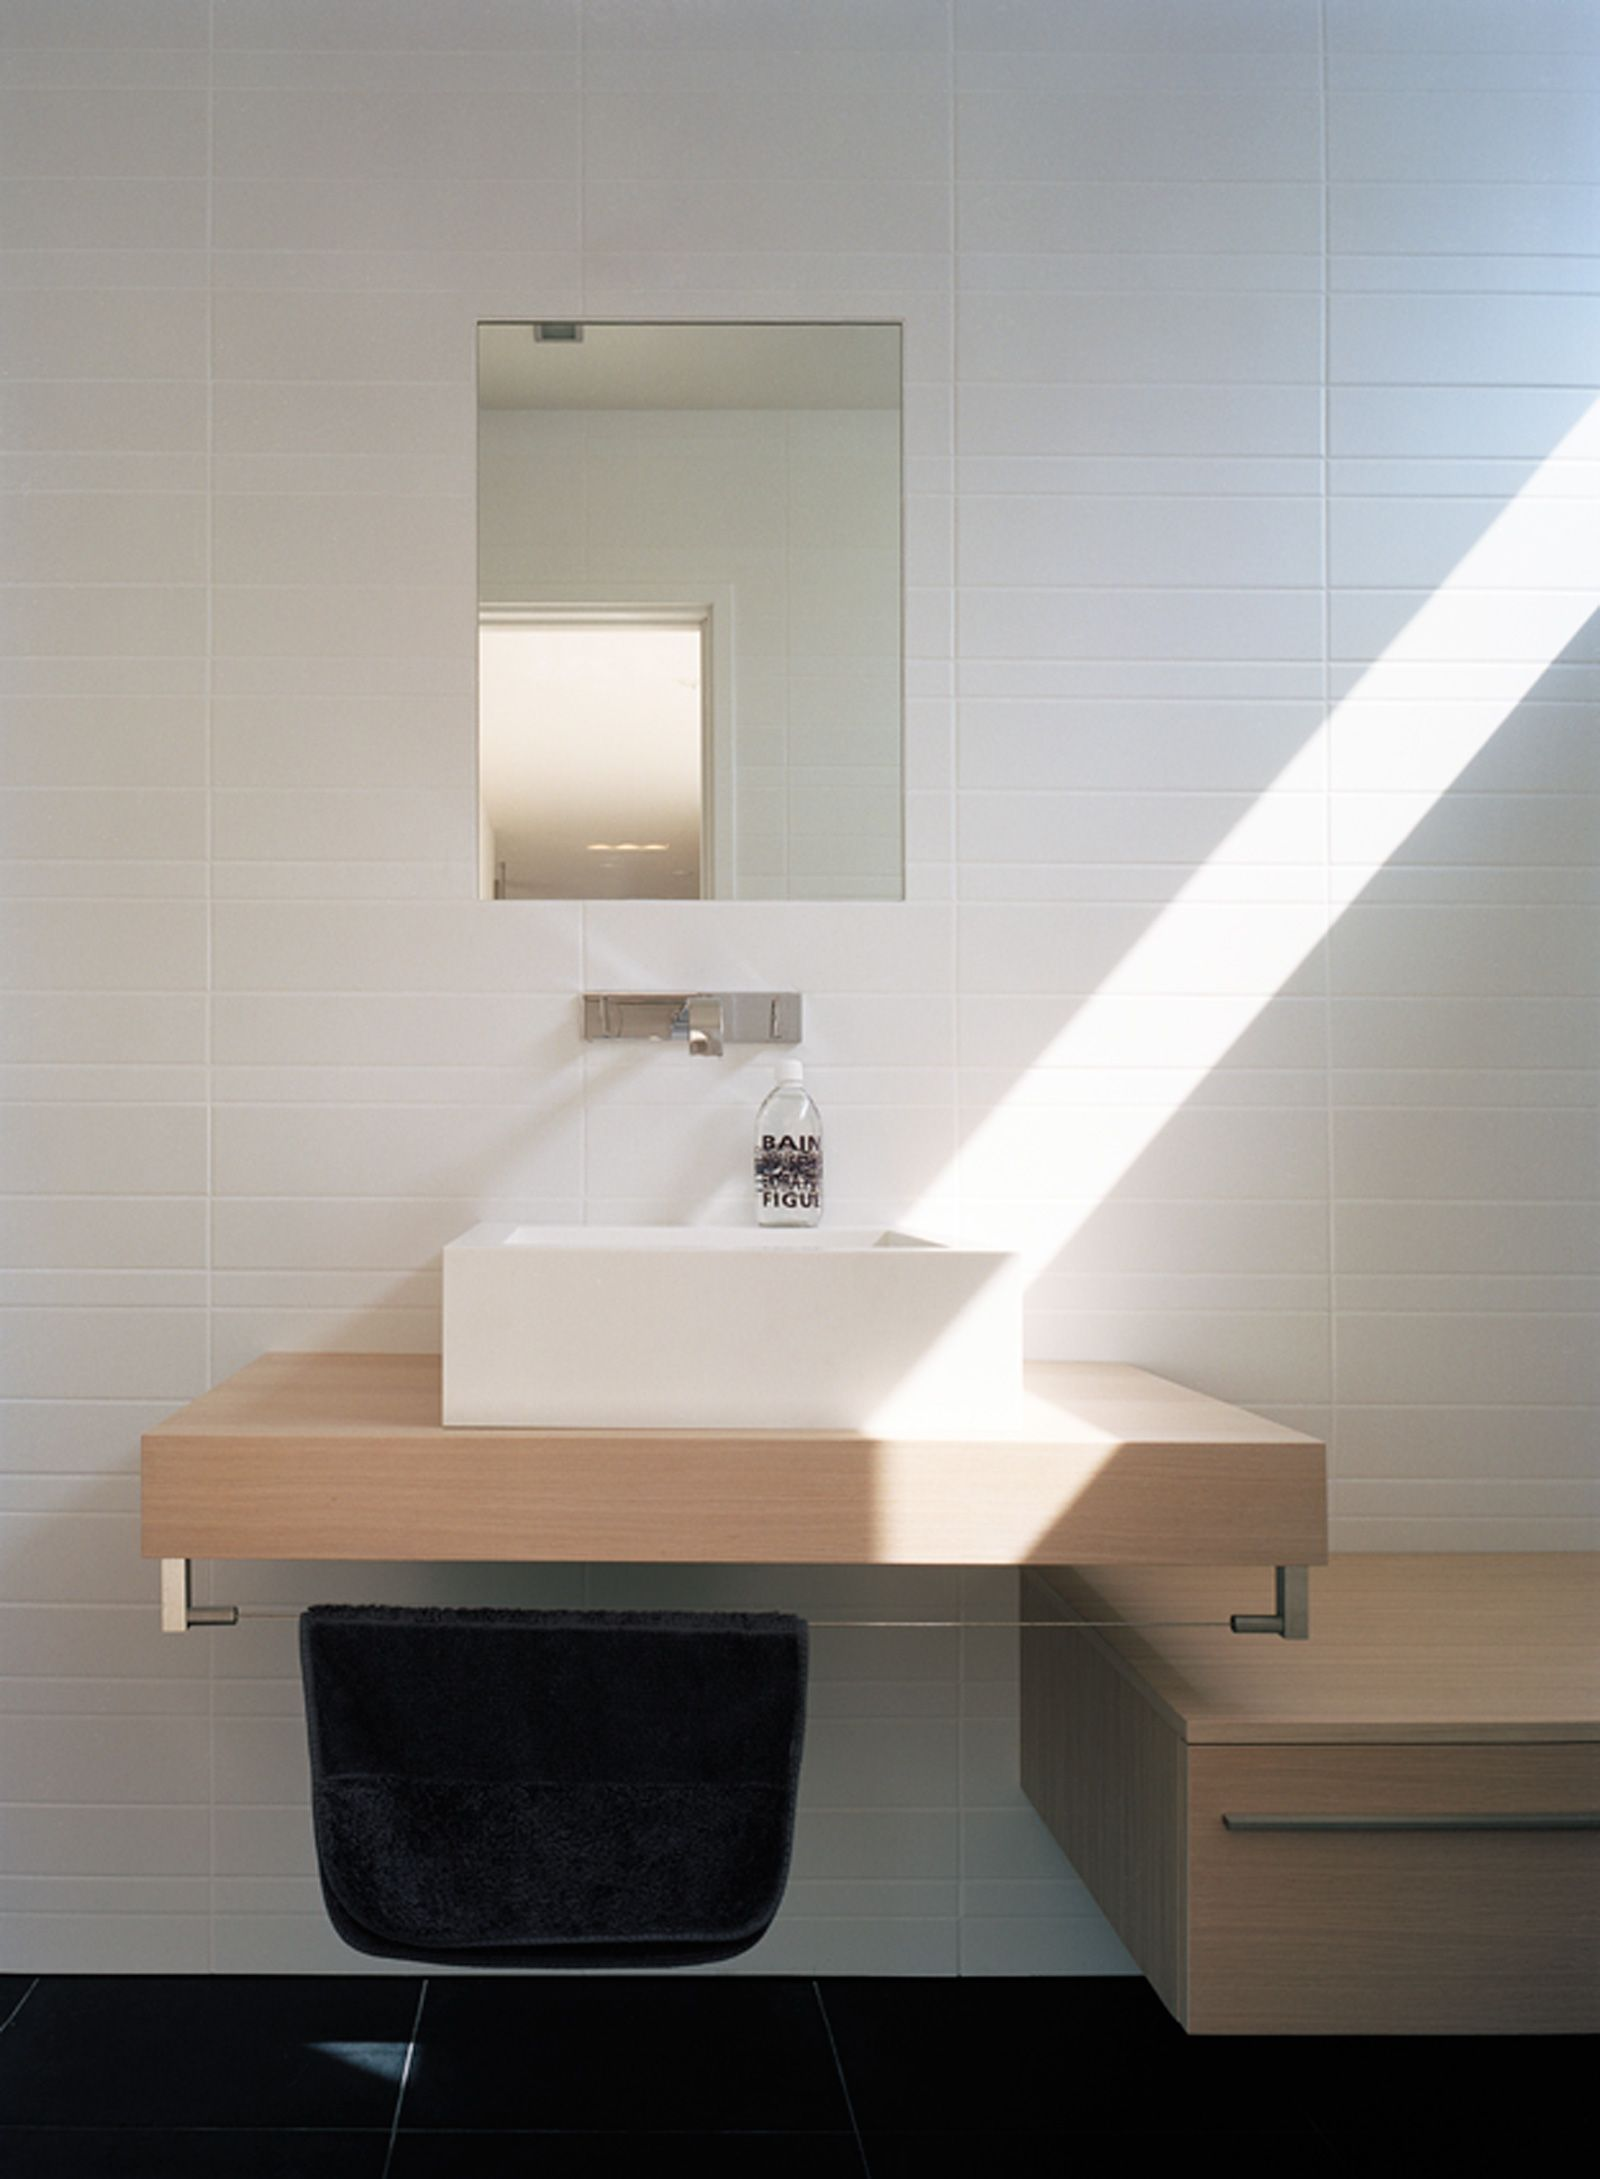 storage awesome tiled ideas houzz bathroom tile splendid up shower stand design showers